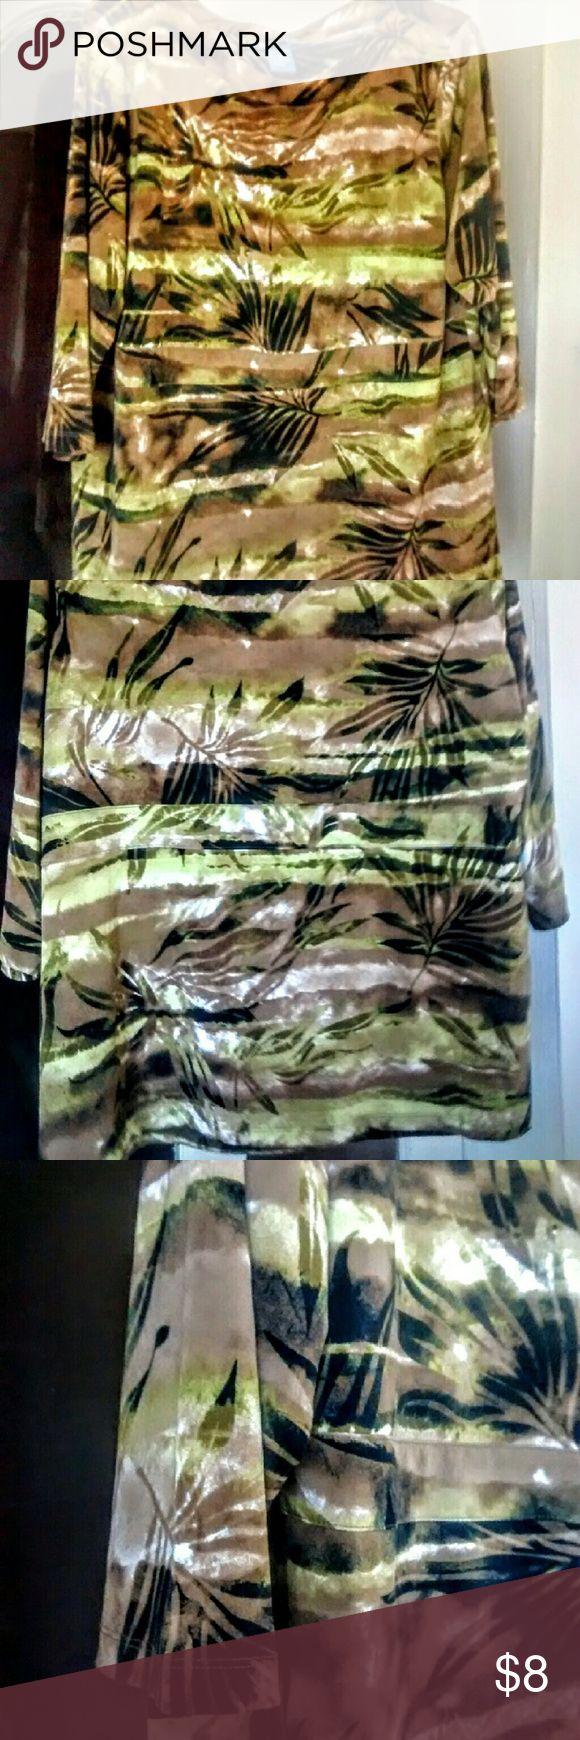 Koret Size 1X Women's Tunic Excellent condition Koret women's top, jungle print, size 1X. 3/4 length sleeve, band across the middle. Koret Tops Tunics